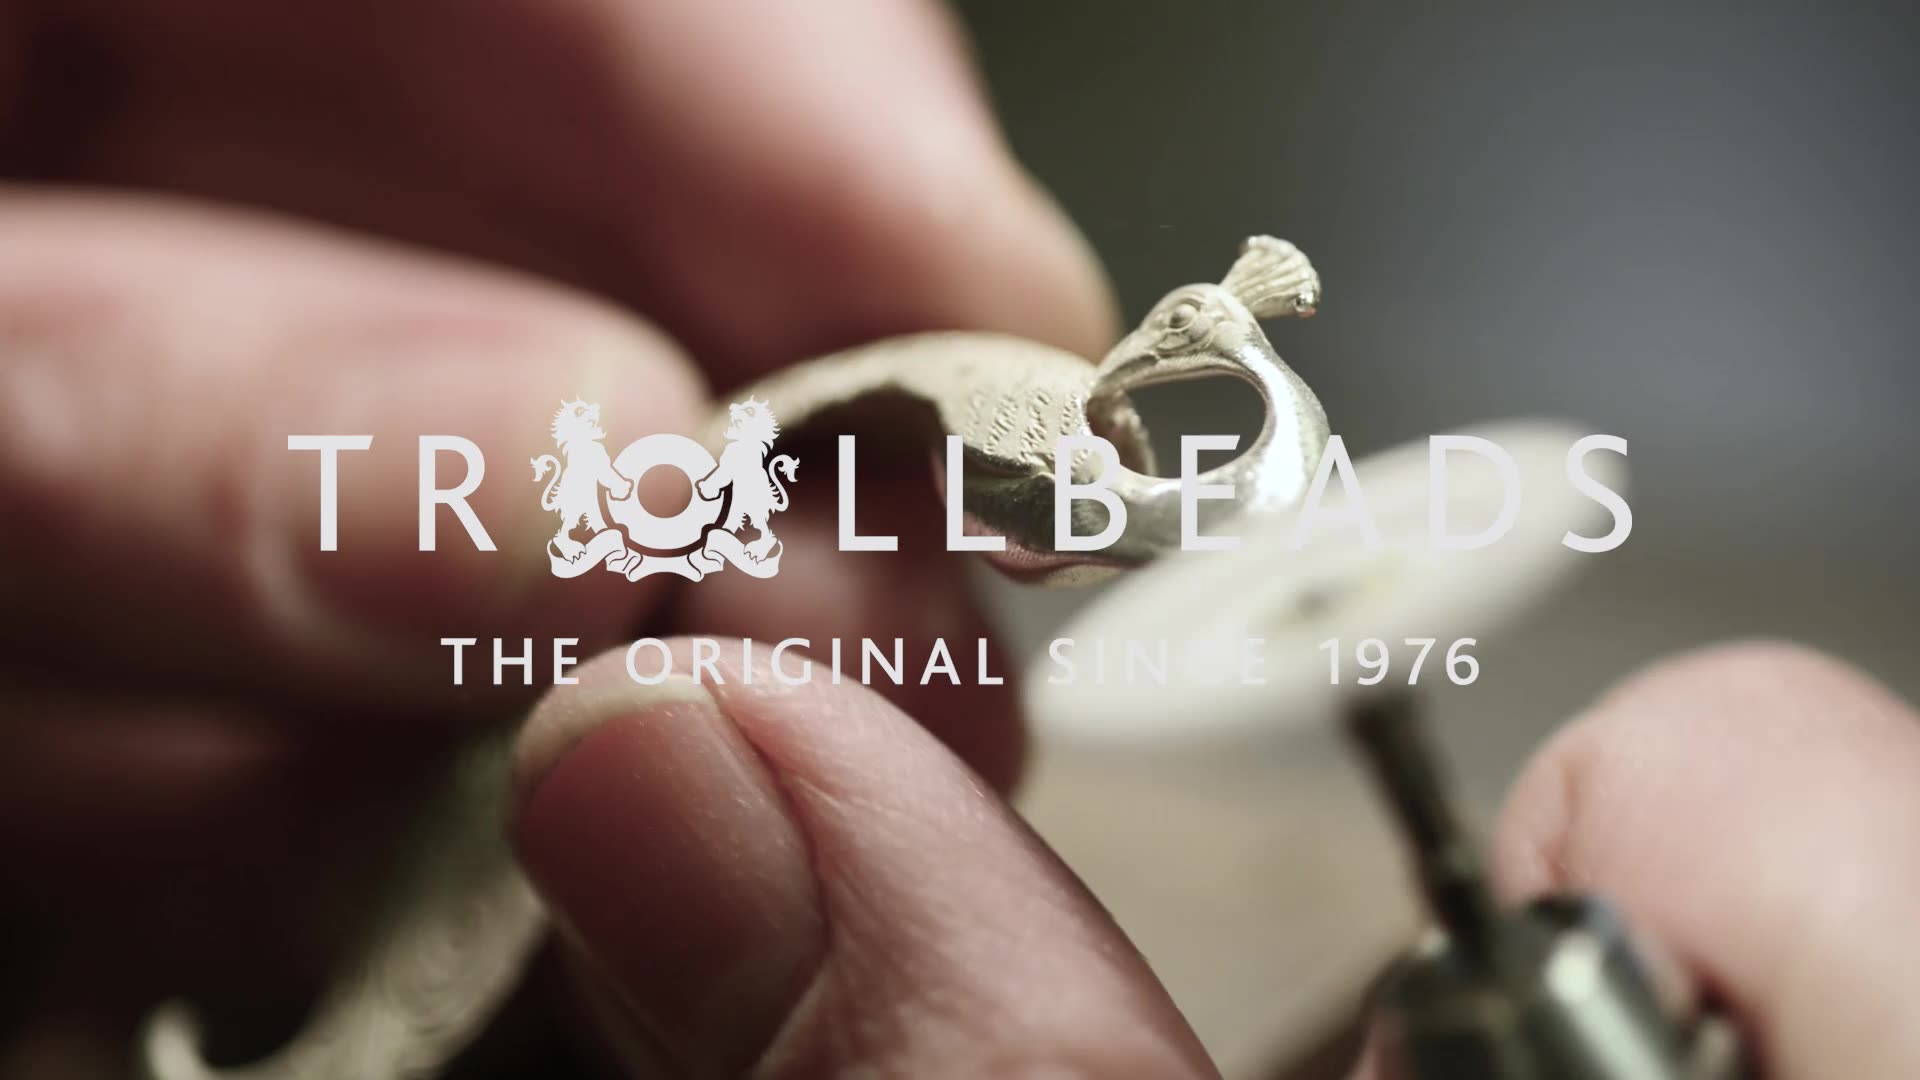 Craftsmanship in stunning silver pendant